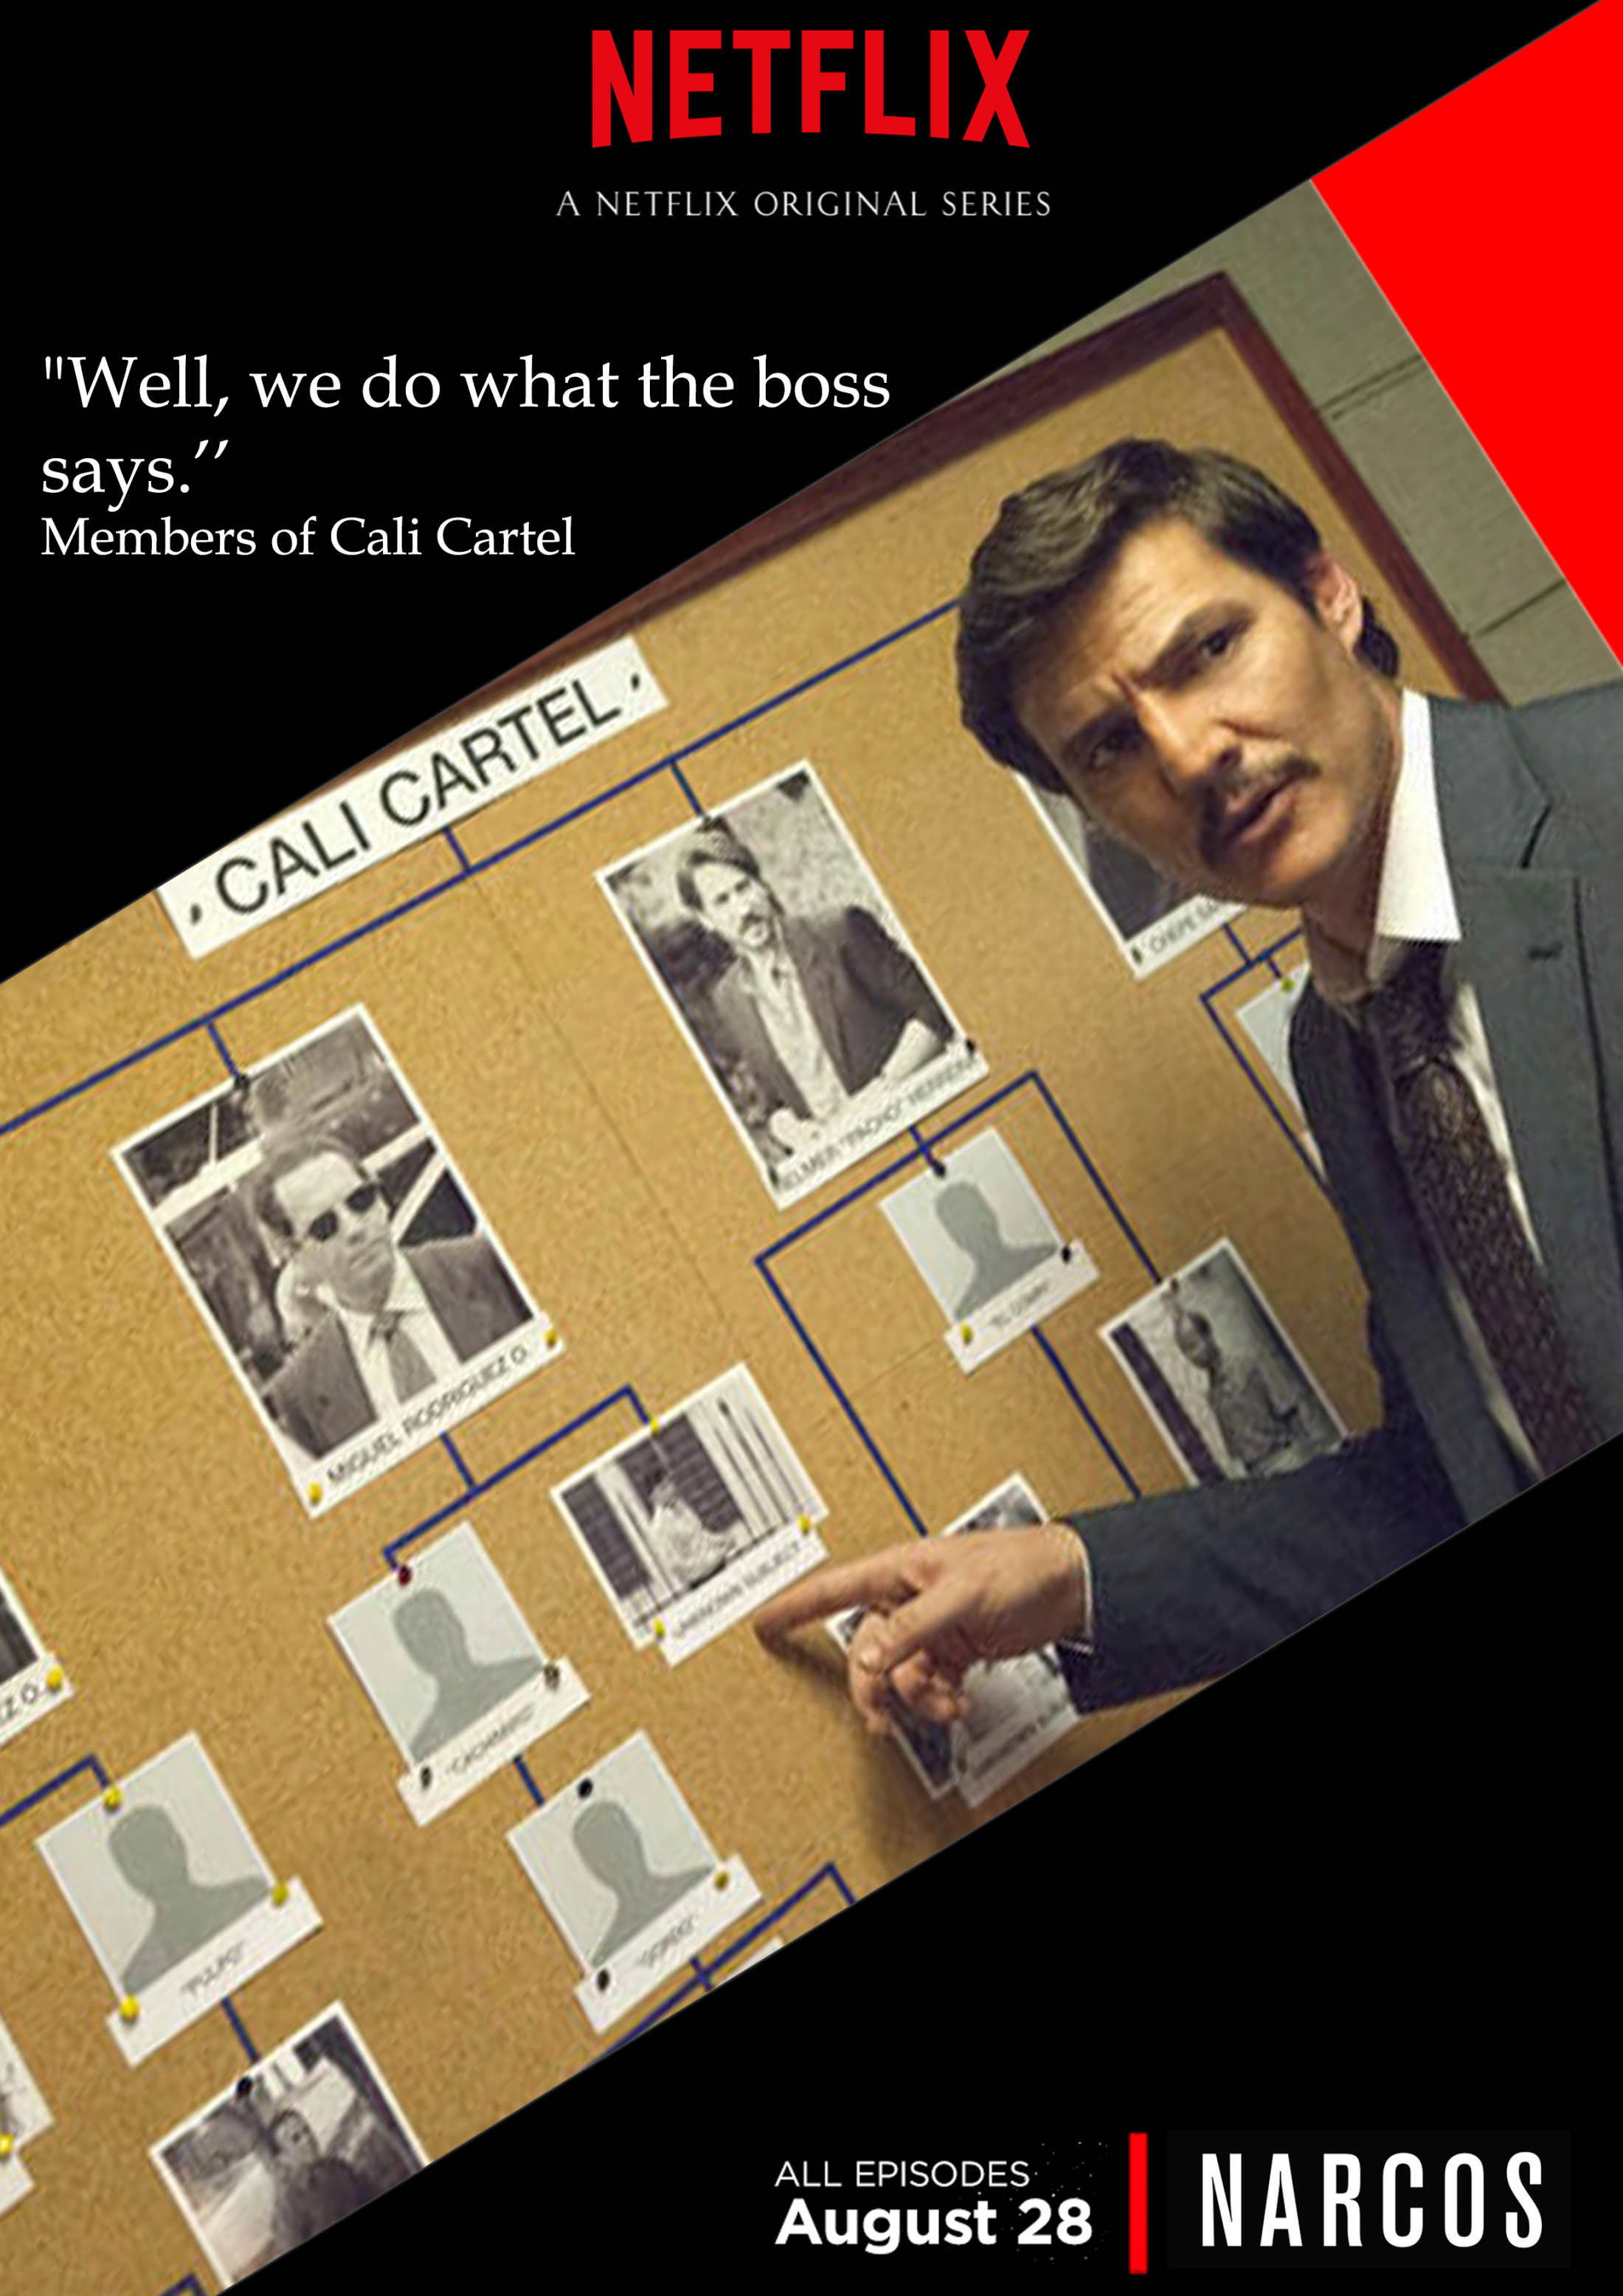 Netflix Print Ad - Narcos, 2